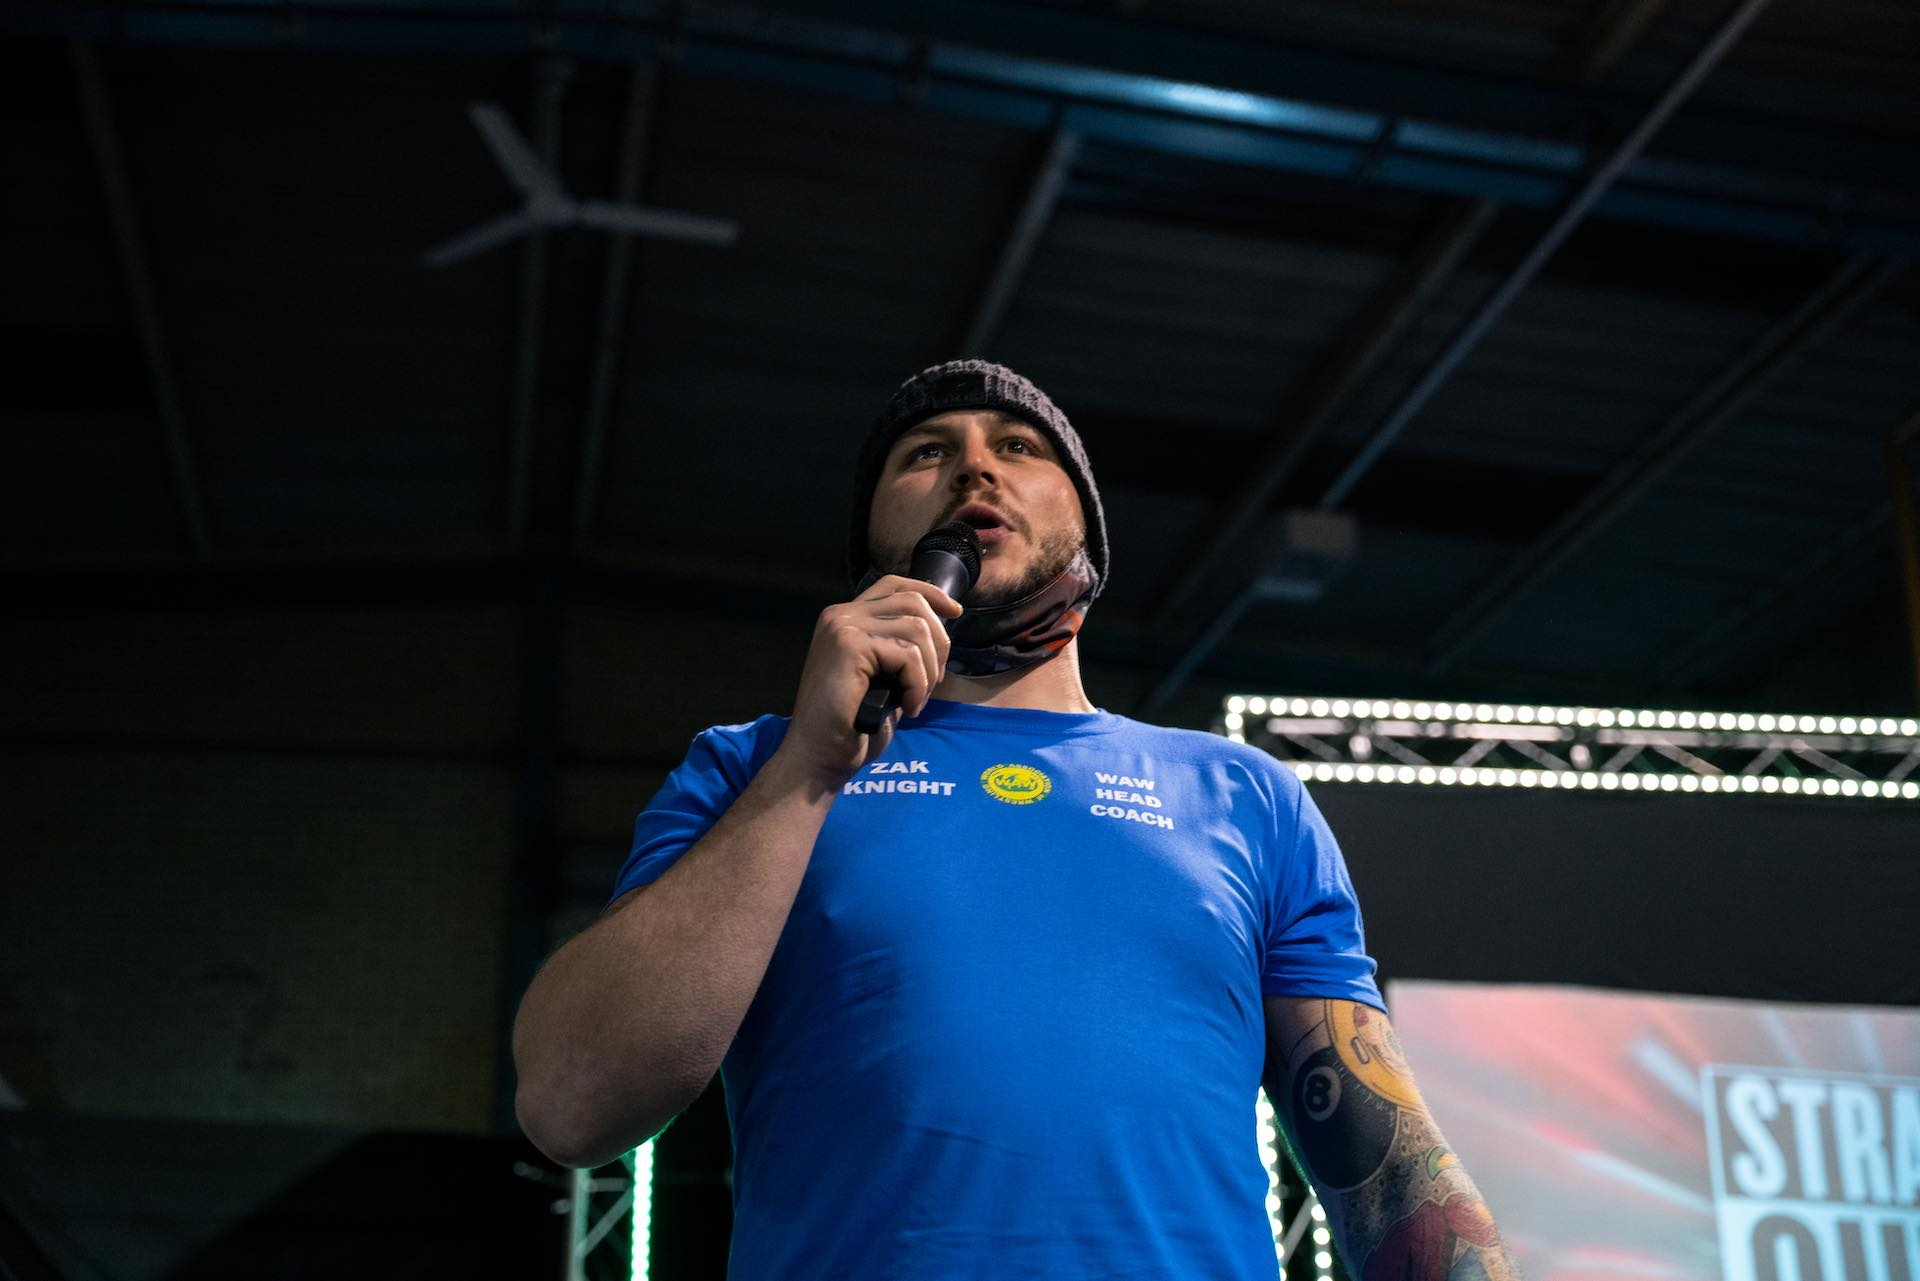 Zak Knight announces WAW Academy Blue Squad